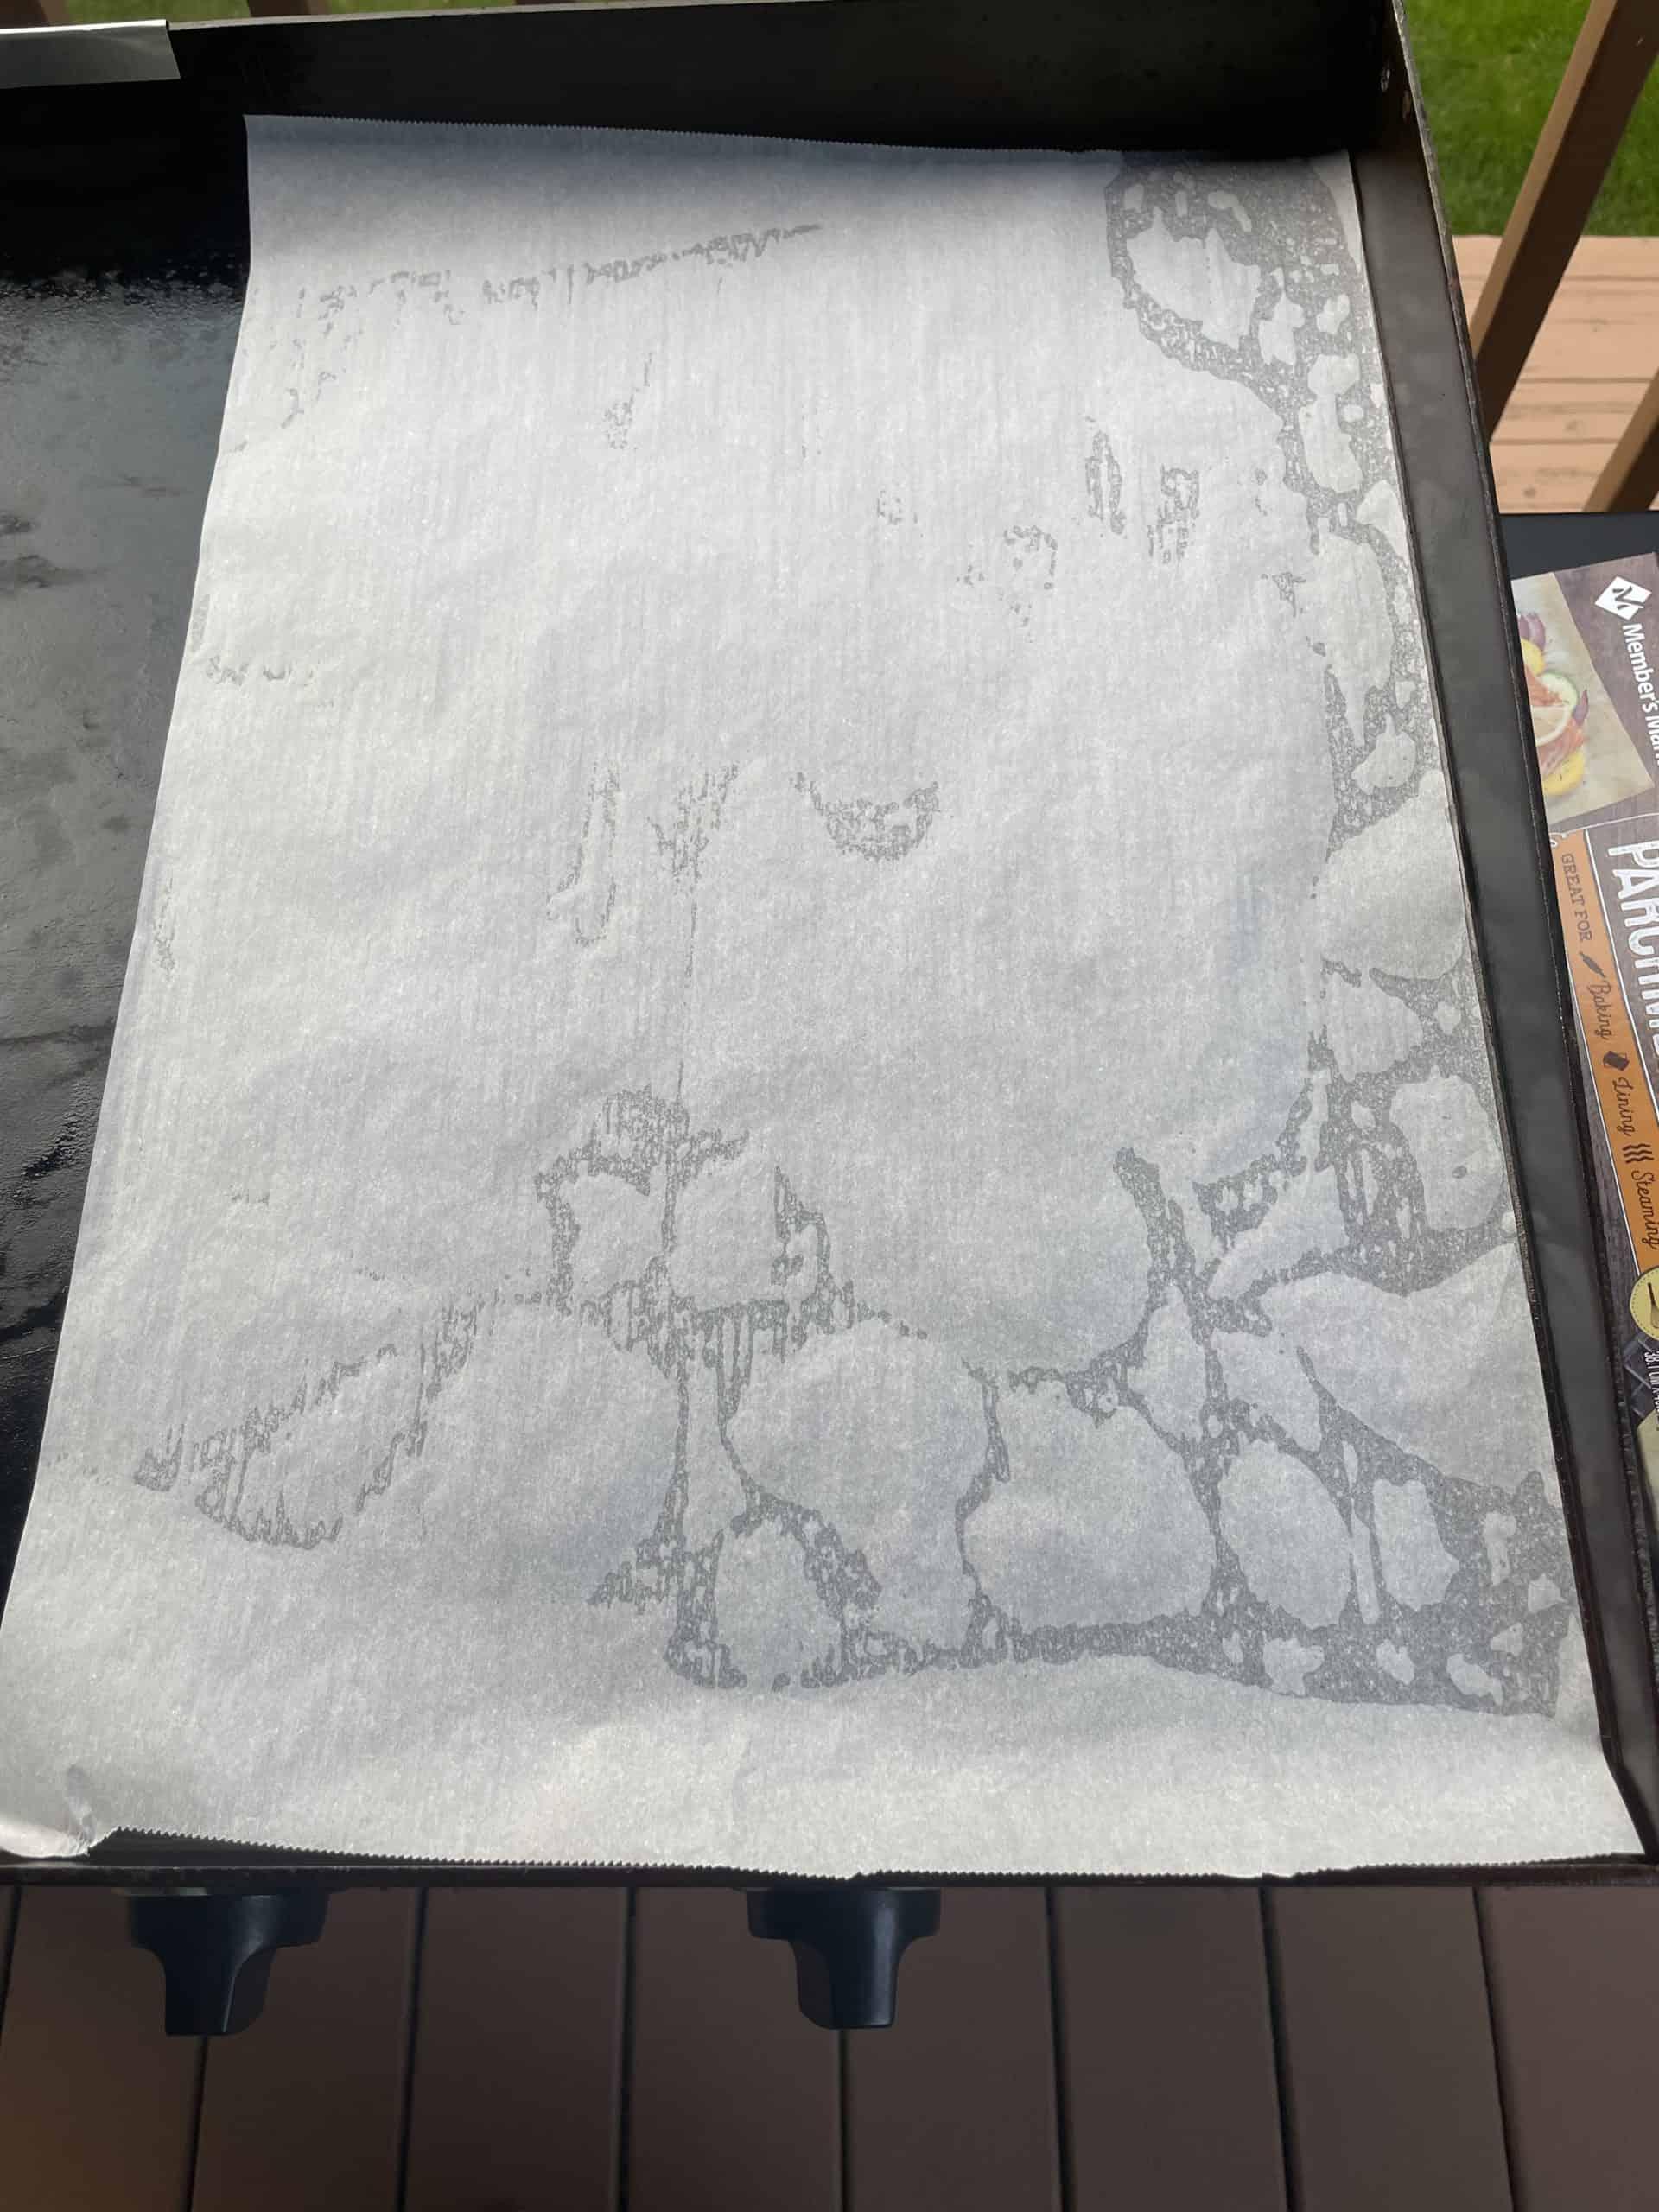 Parchment Paper on top of Blackstone Griddle.